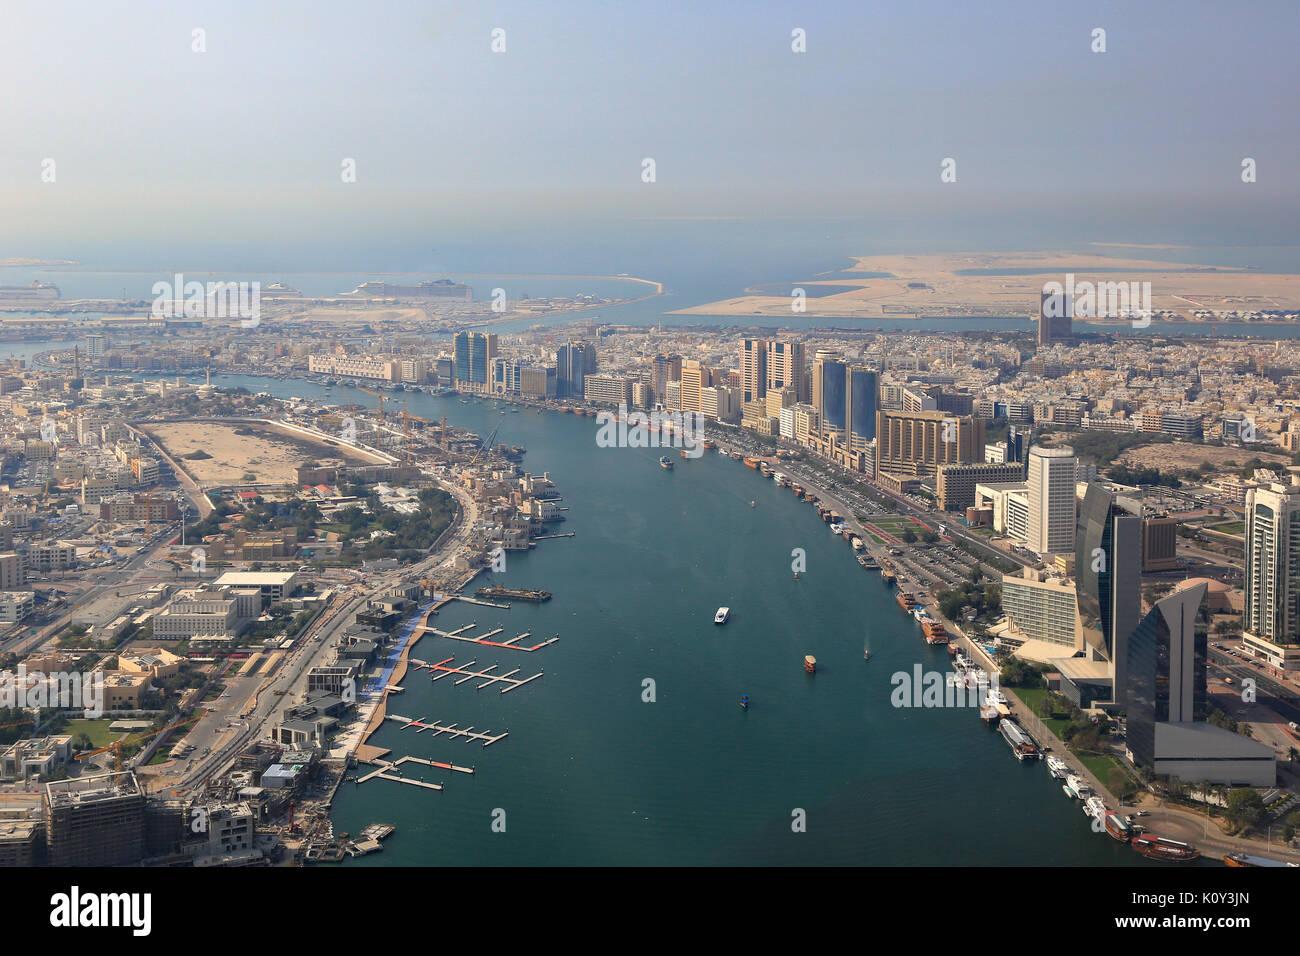 Der Dubai Creek delta Luftbild Fotografie VAE Stockbild